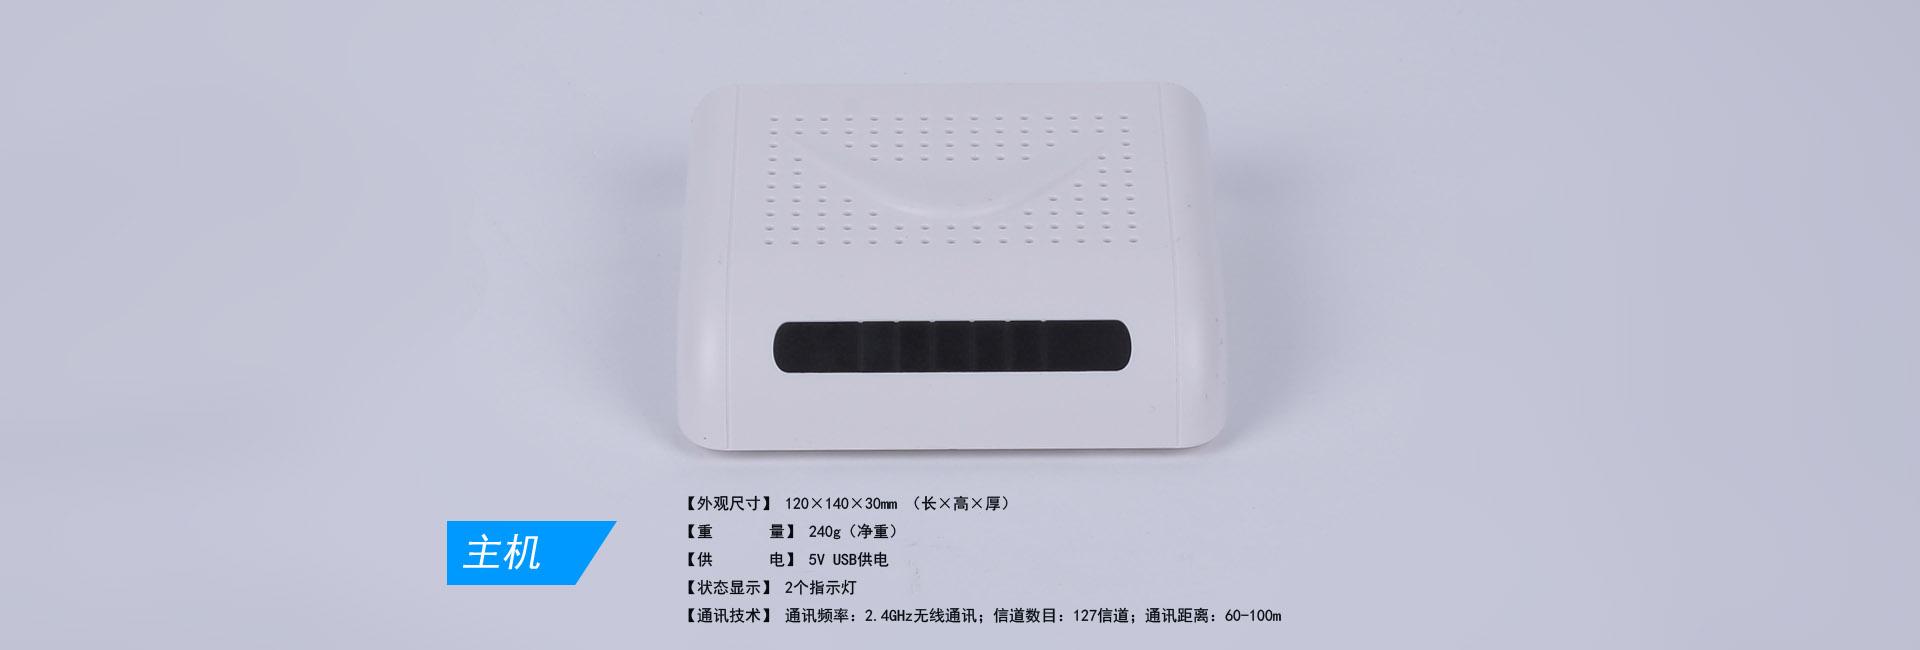 Product_zhuji35.jpg